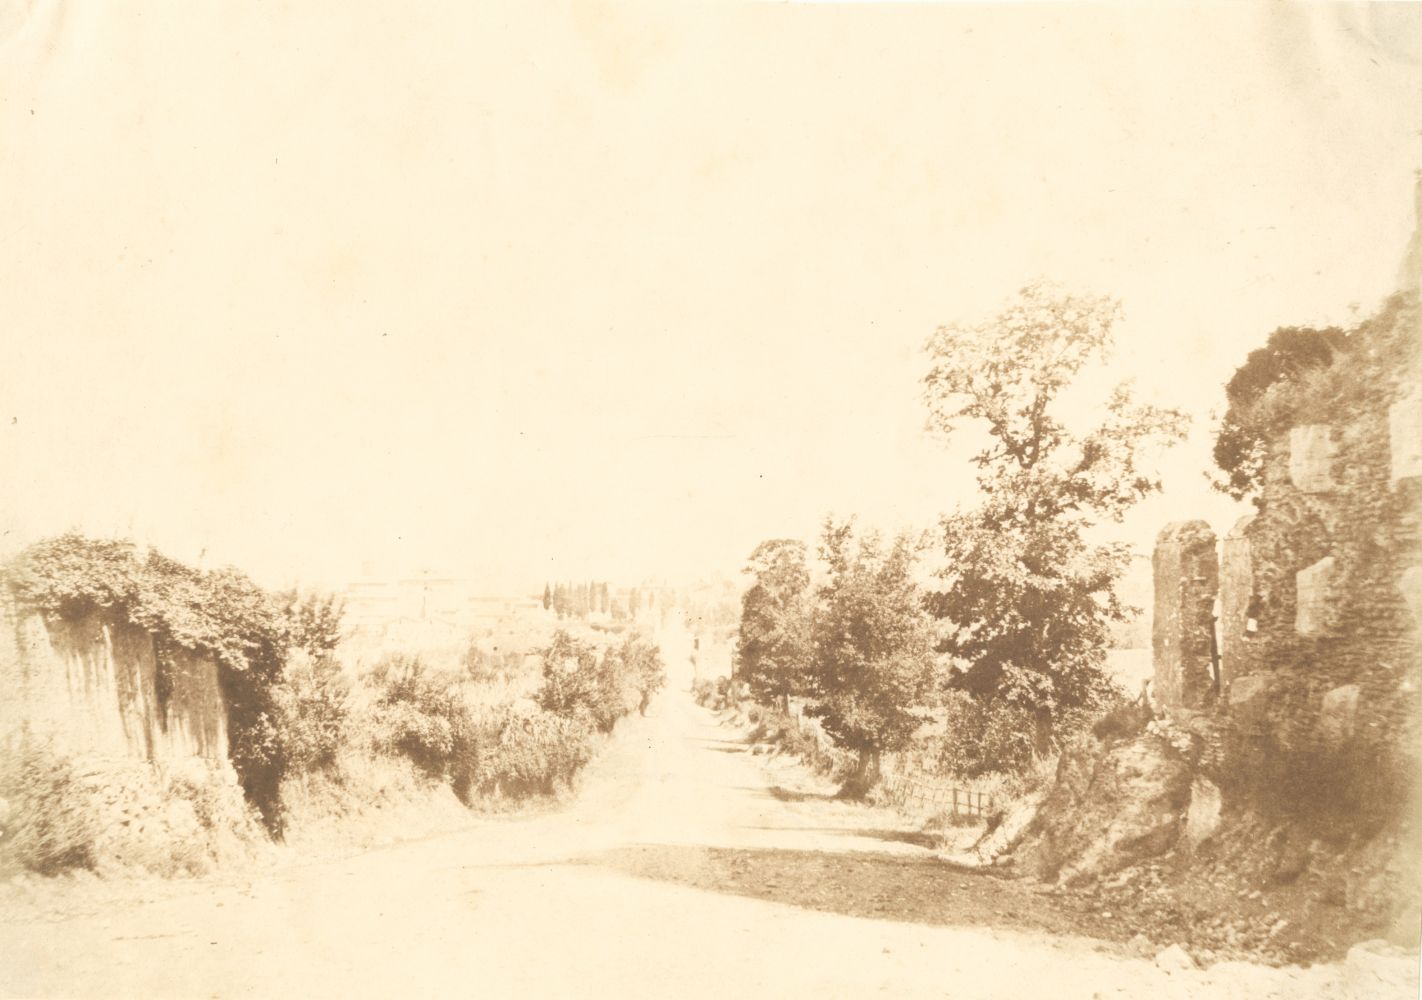 Giacomo CANEVA (Italian, 1813-1865) Via Appia, circa 1850 Salt print from a paper negative